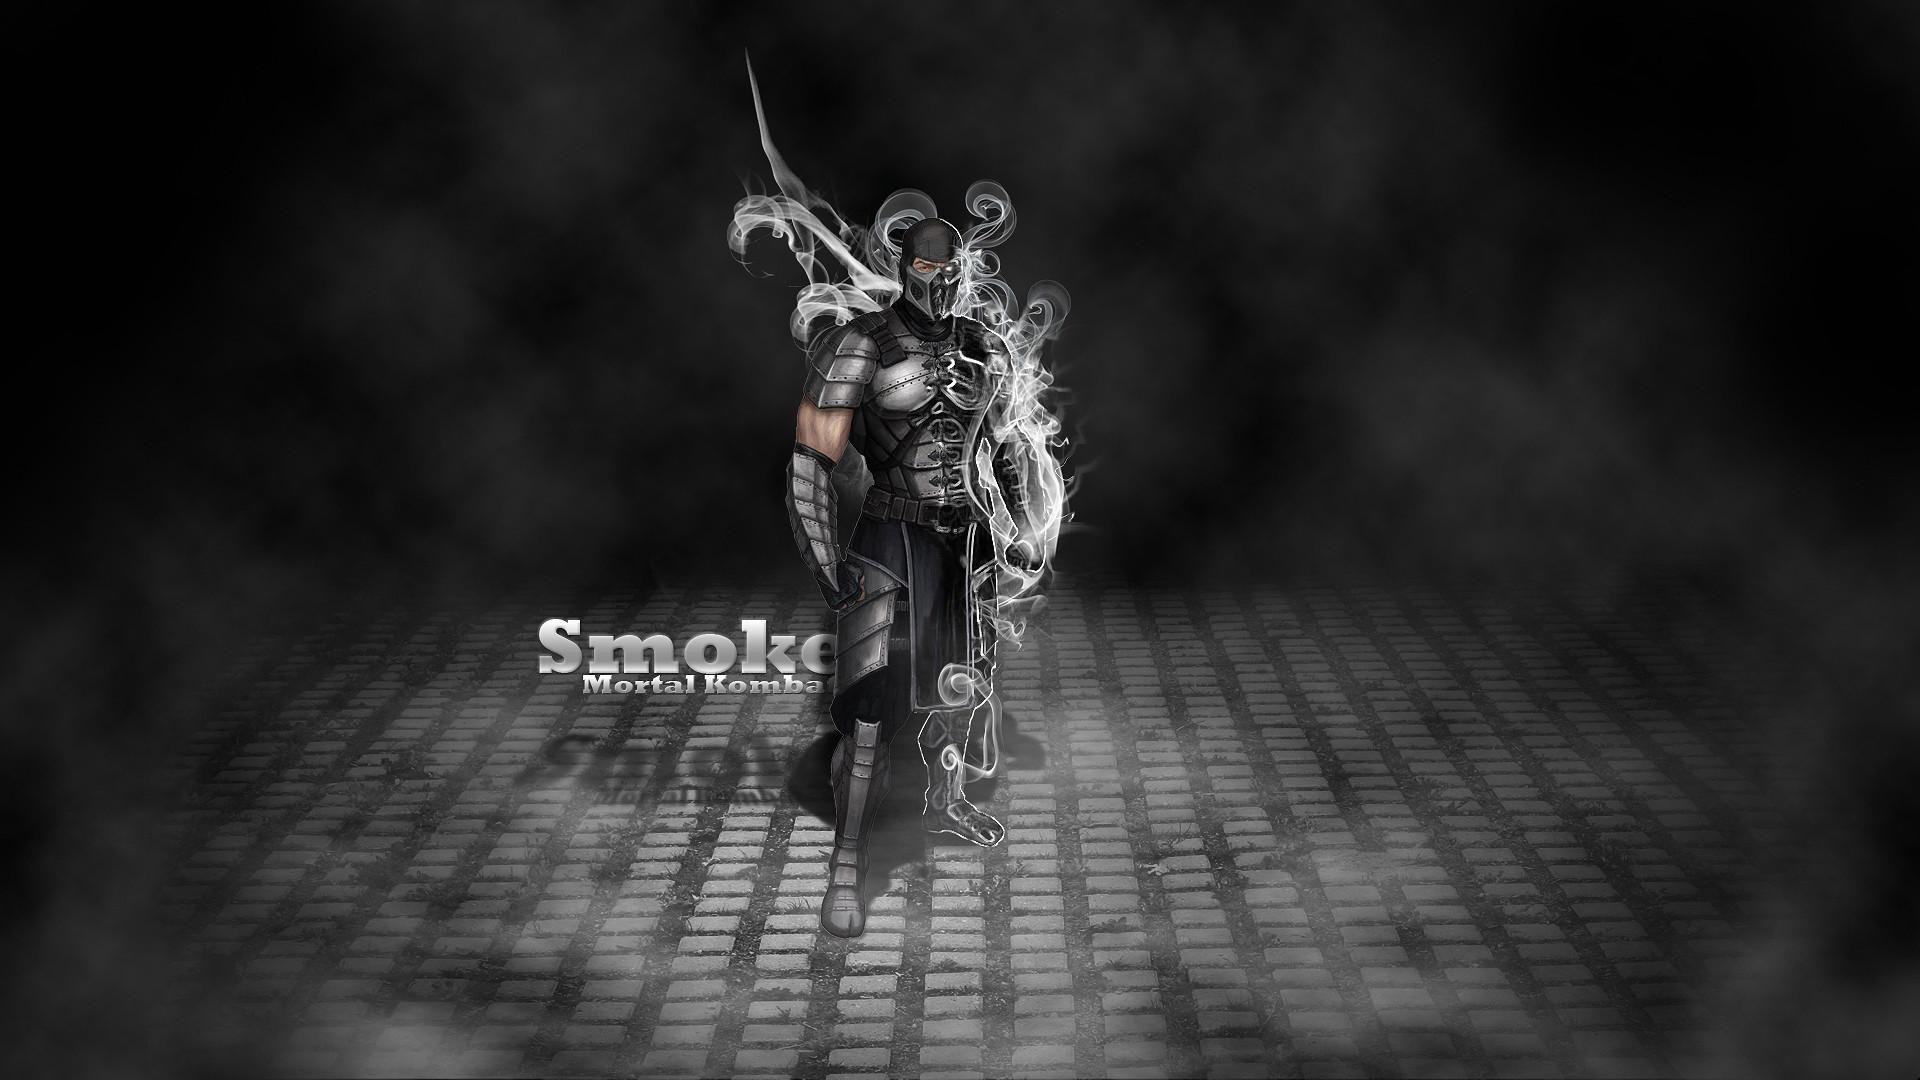 Mortal Kombat X Smoke Wallpaper – WallpaperSafari